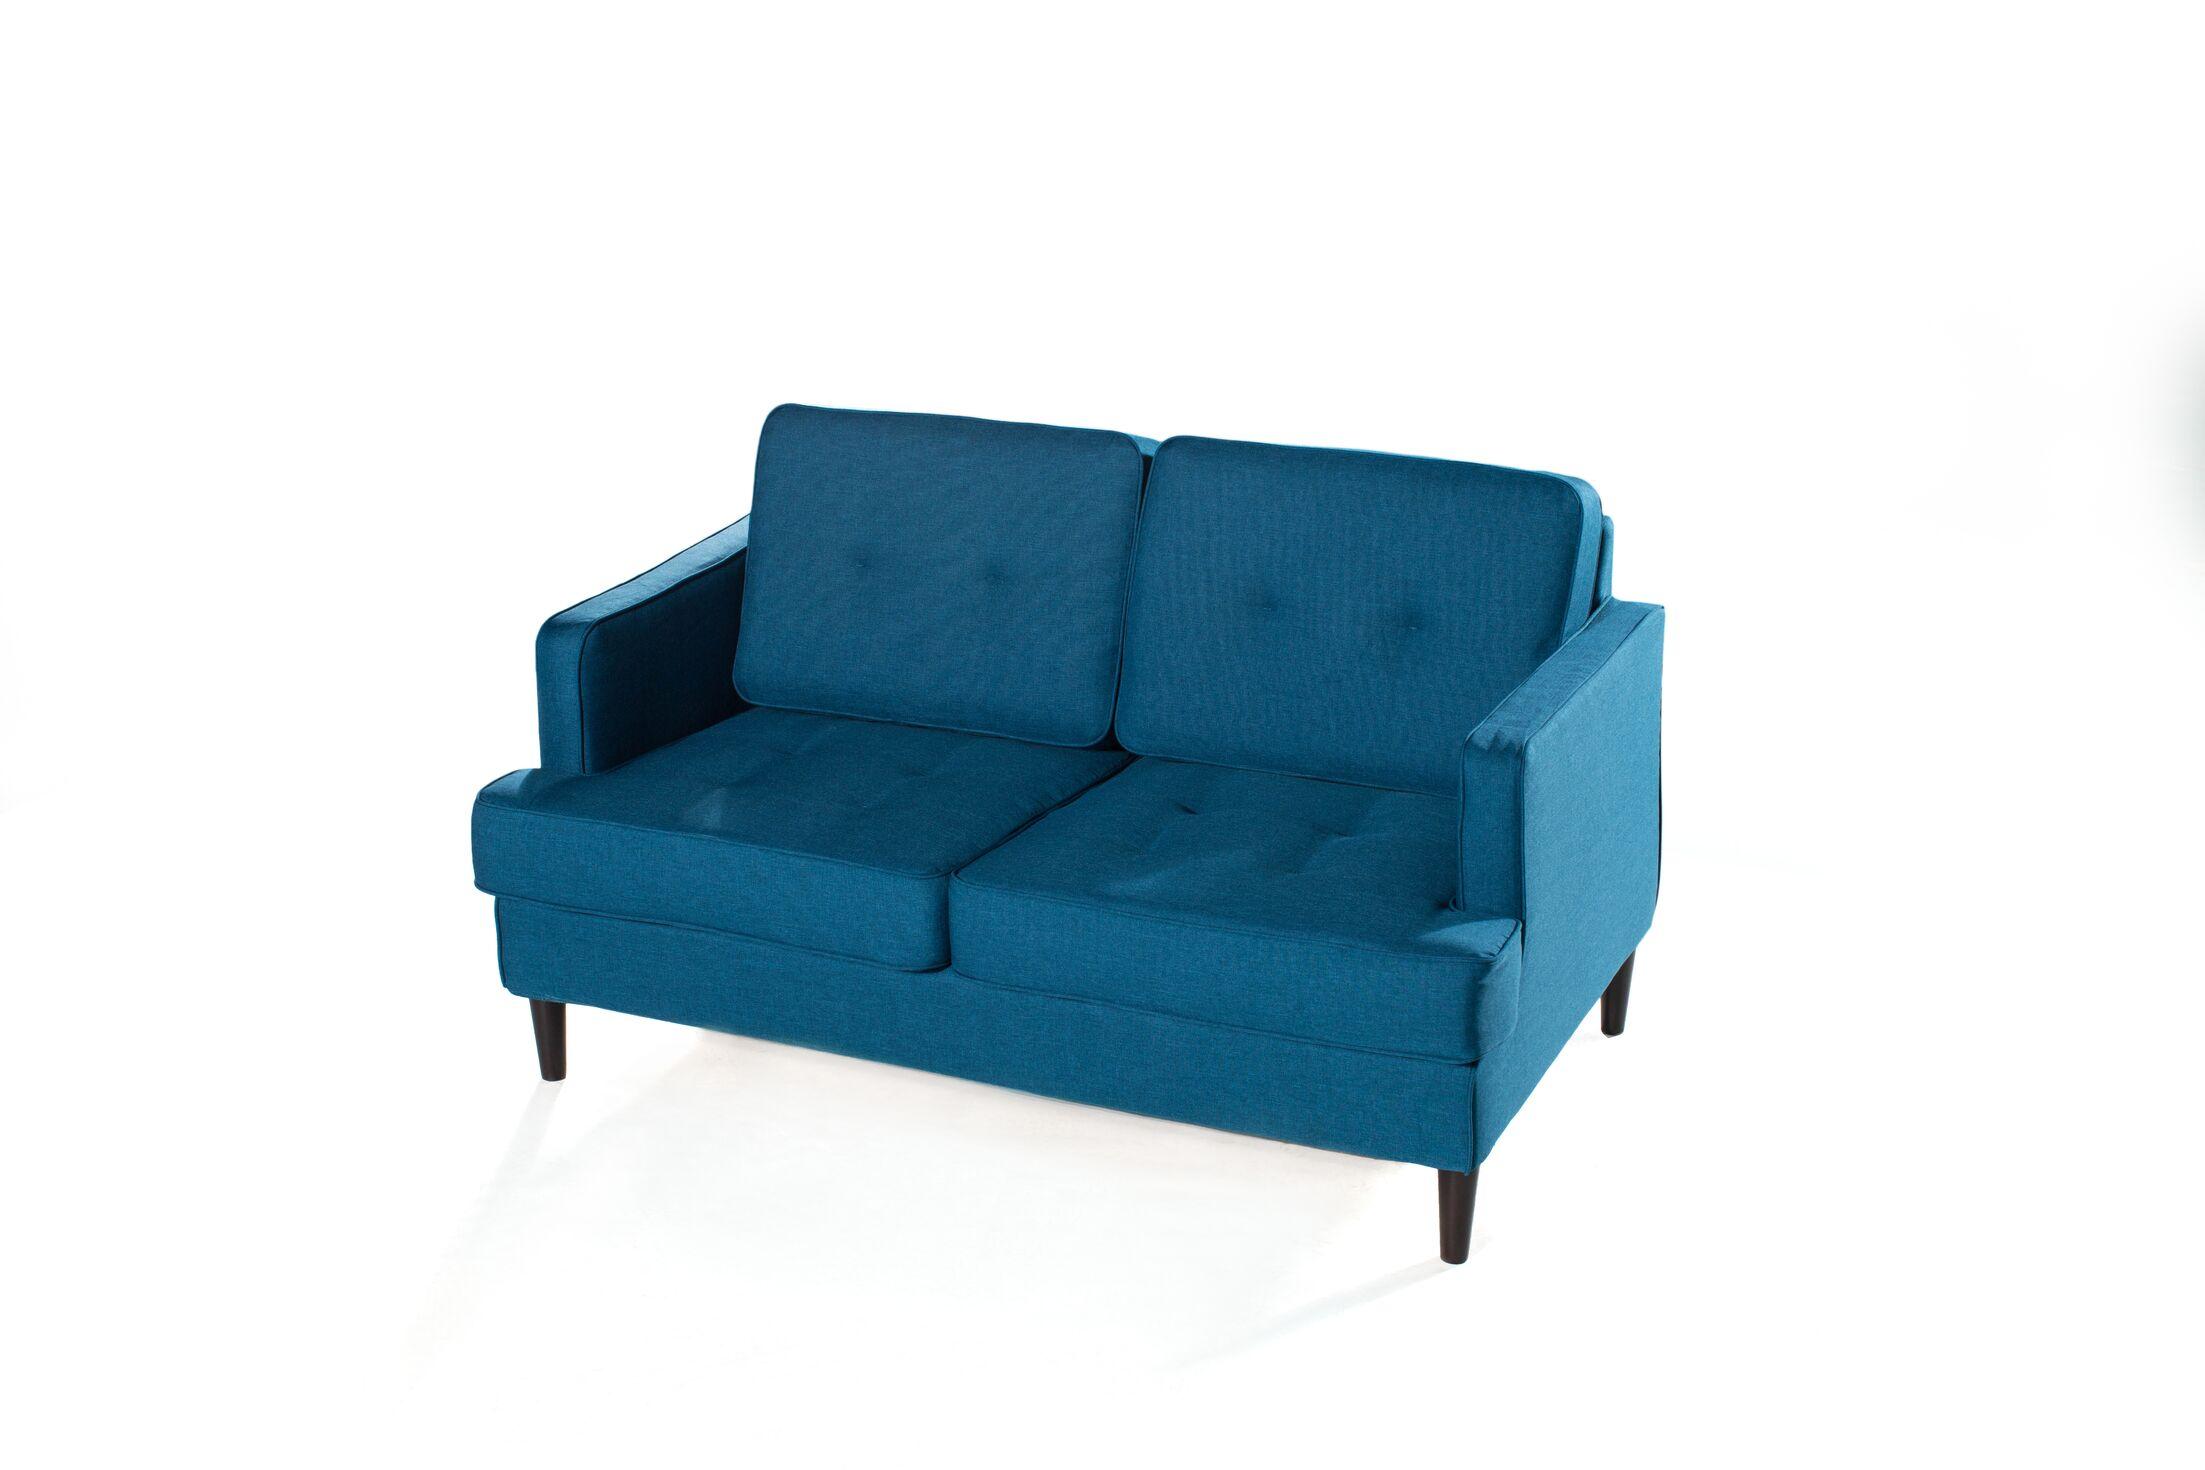 Chingford Standard Loveseat Upholstery: Peacock